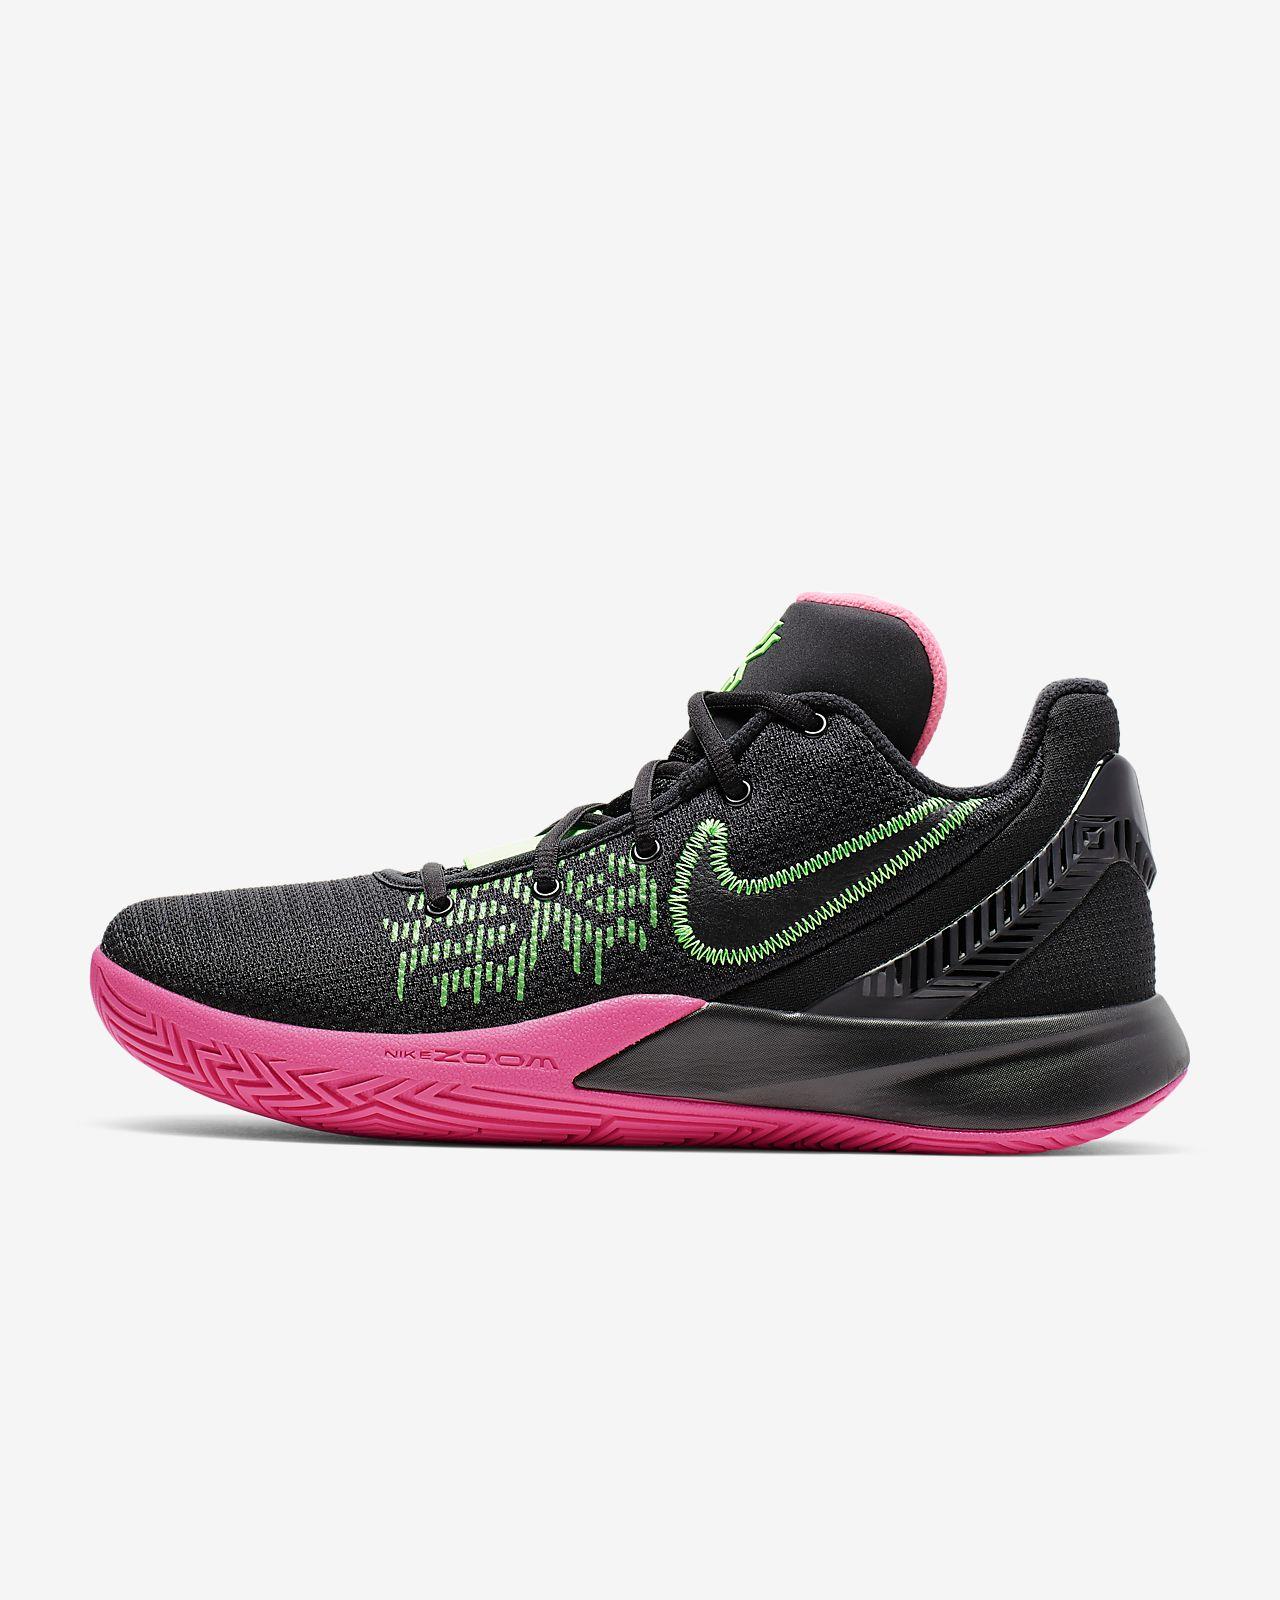 Kyrie Flytrap II Basketball Shoe. Nike AT